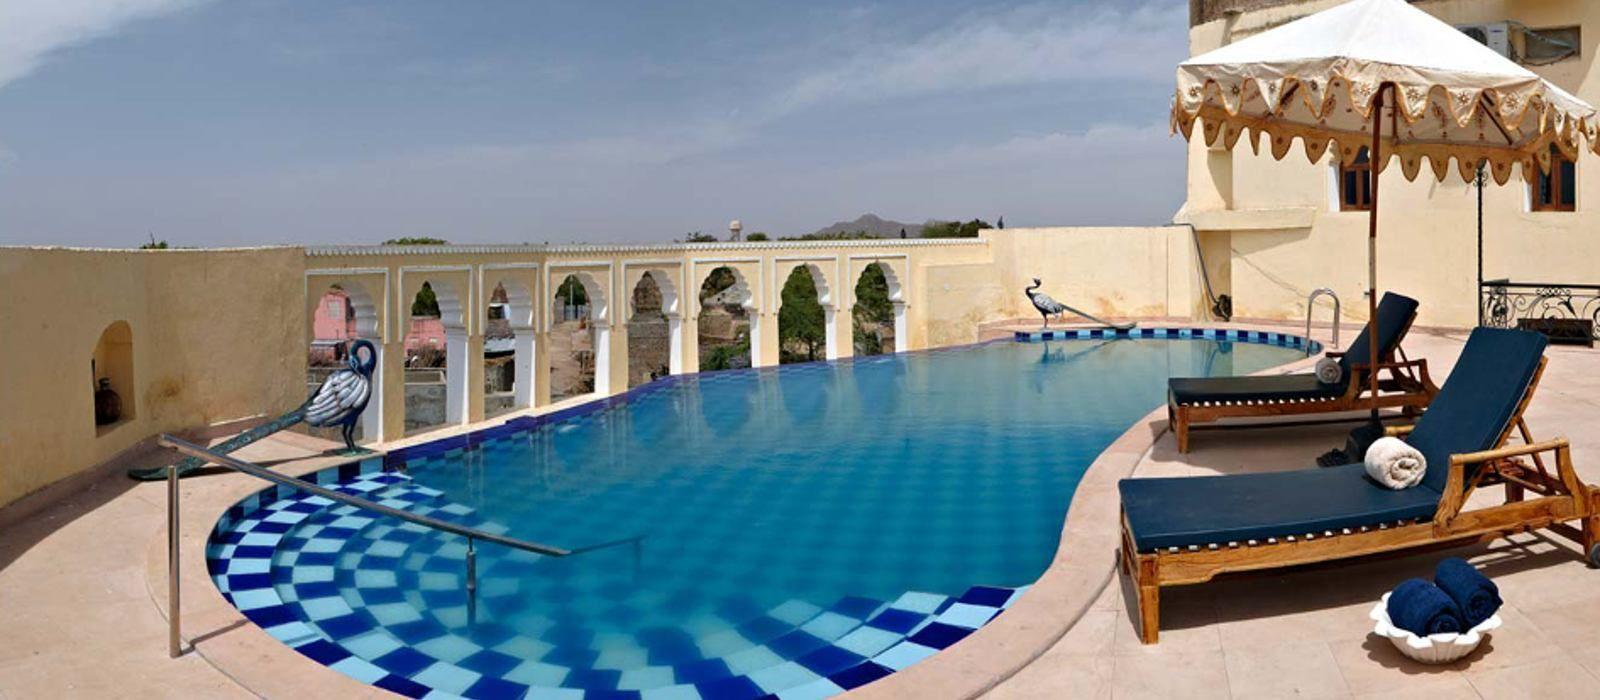 Hotel Fort Barli North India